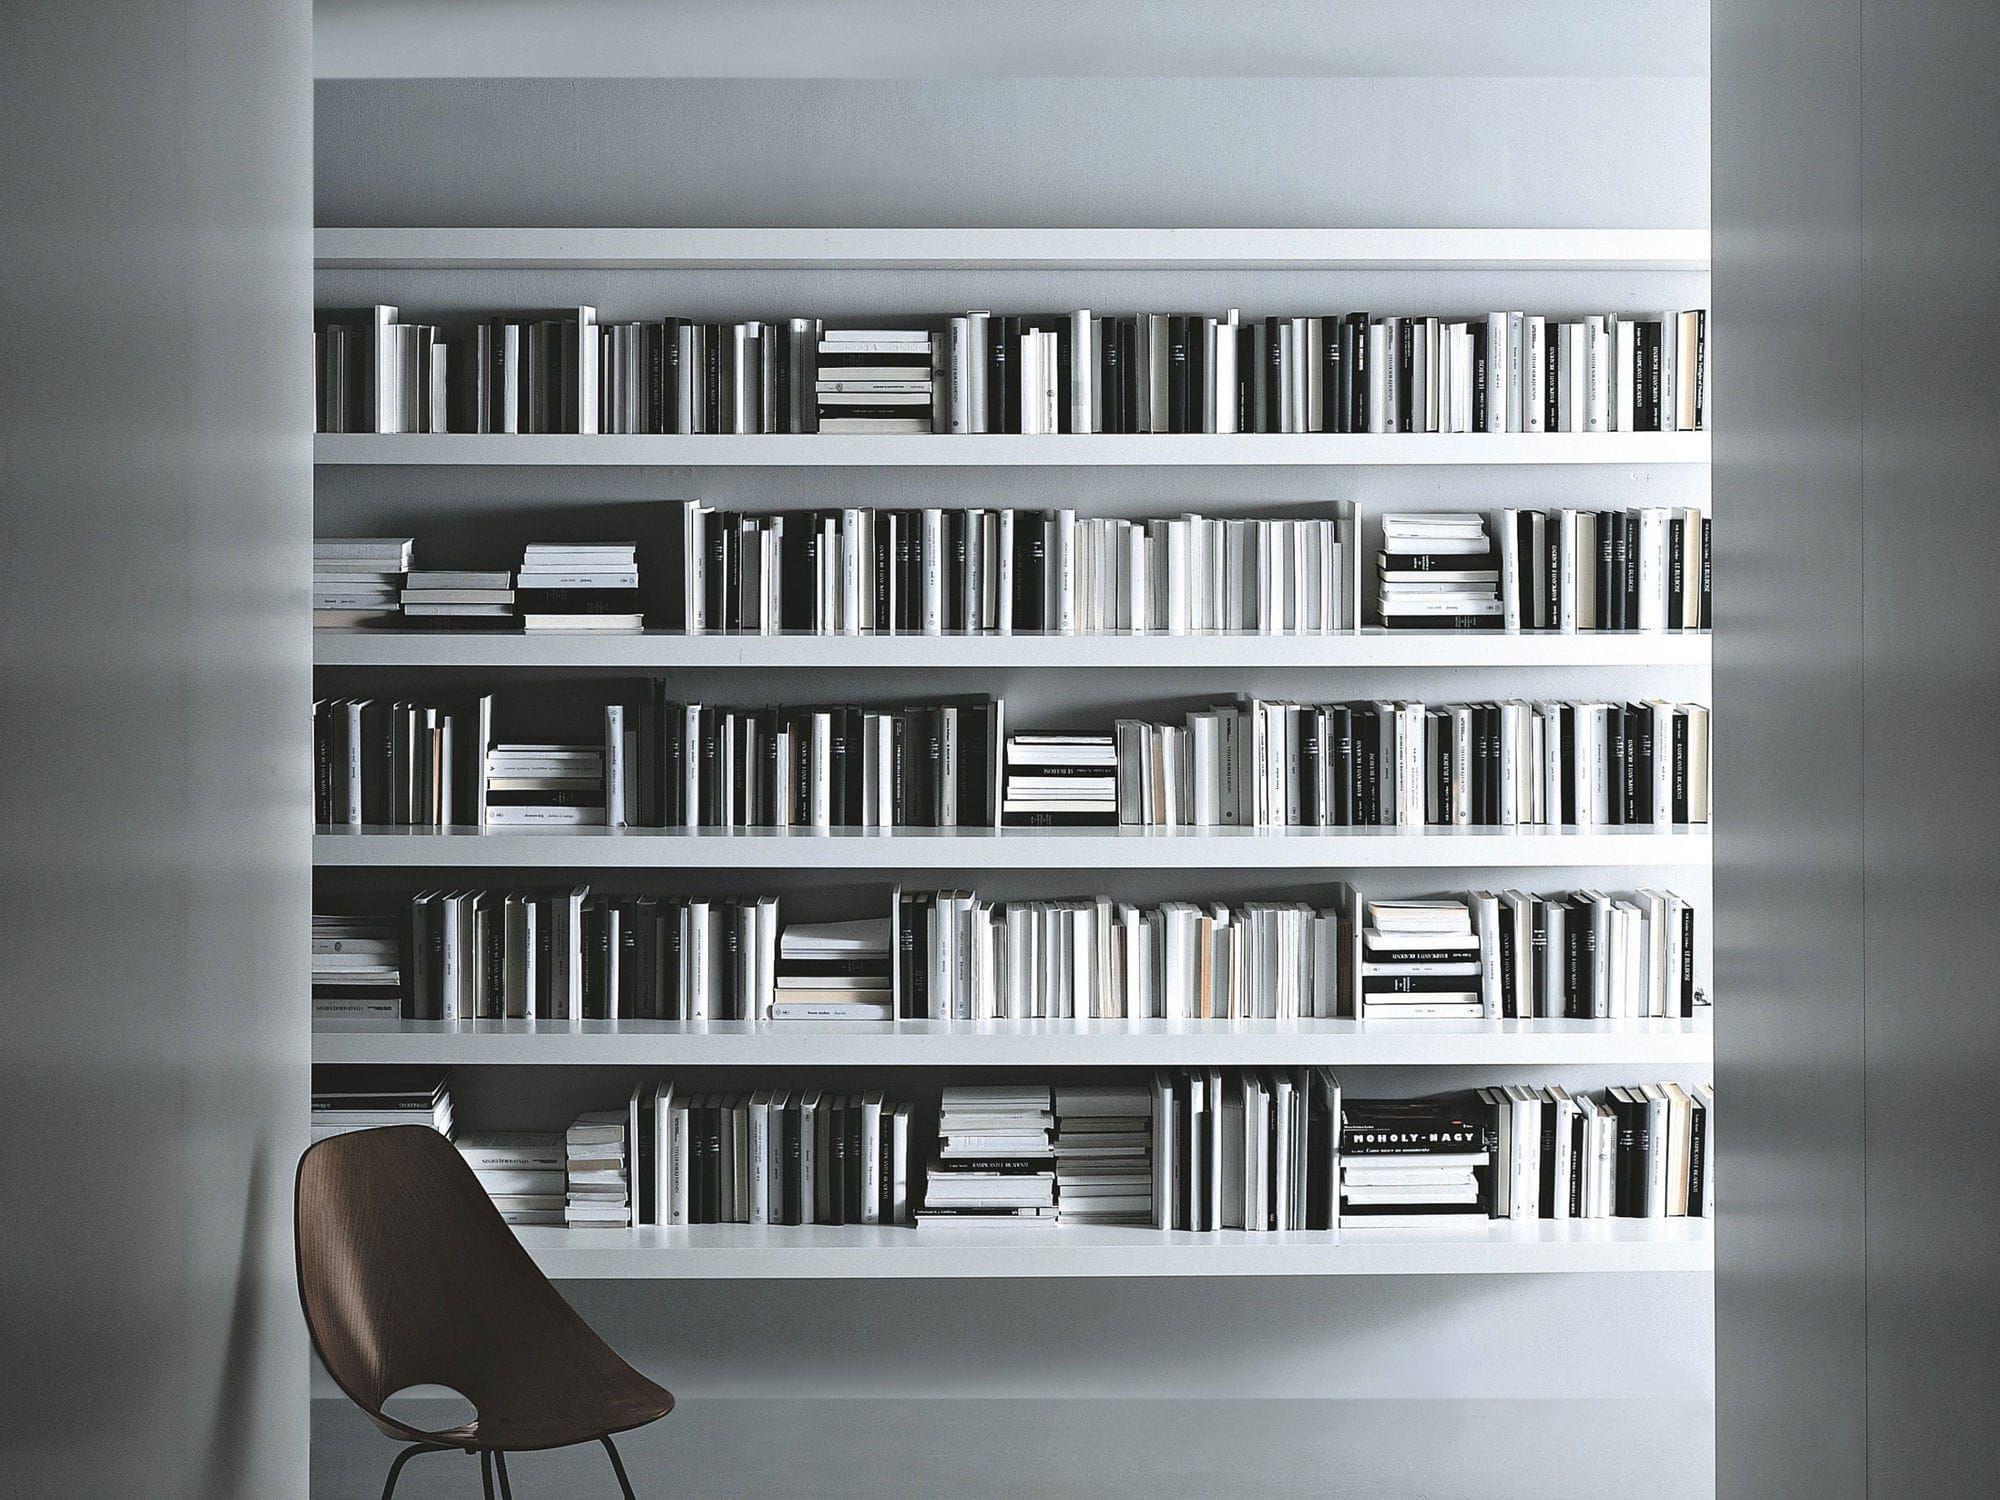 inspirant grande etagere murale d coration fran aise pinterest tag res murale d coration. Black Bedroom Furniture Sets. Home Design Ideas